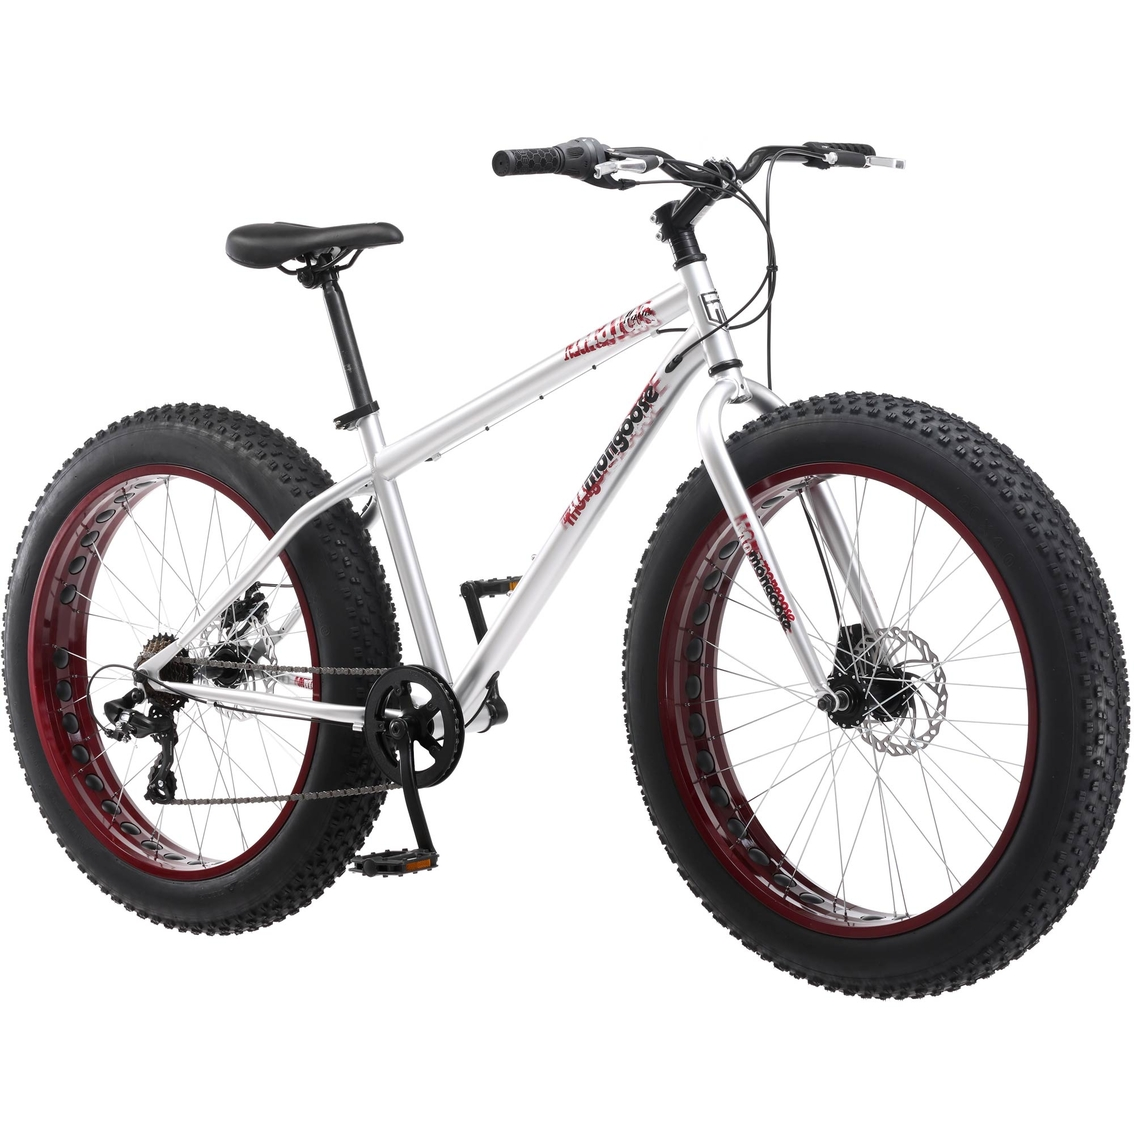 Mongoose Men S Malus 26 In Fat Tire Bike Adult Bikes